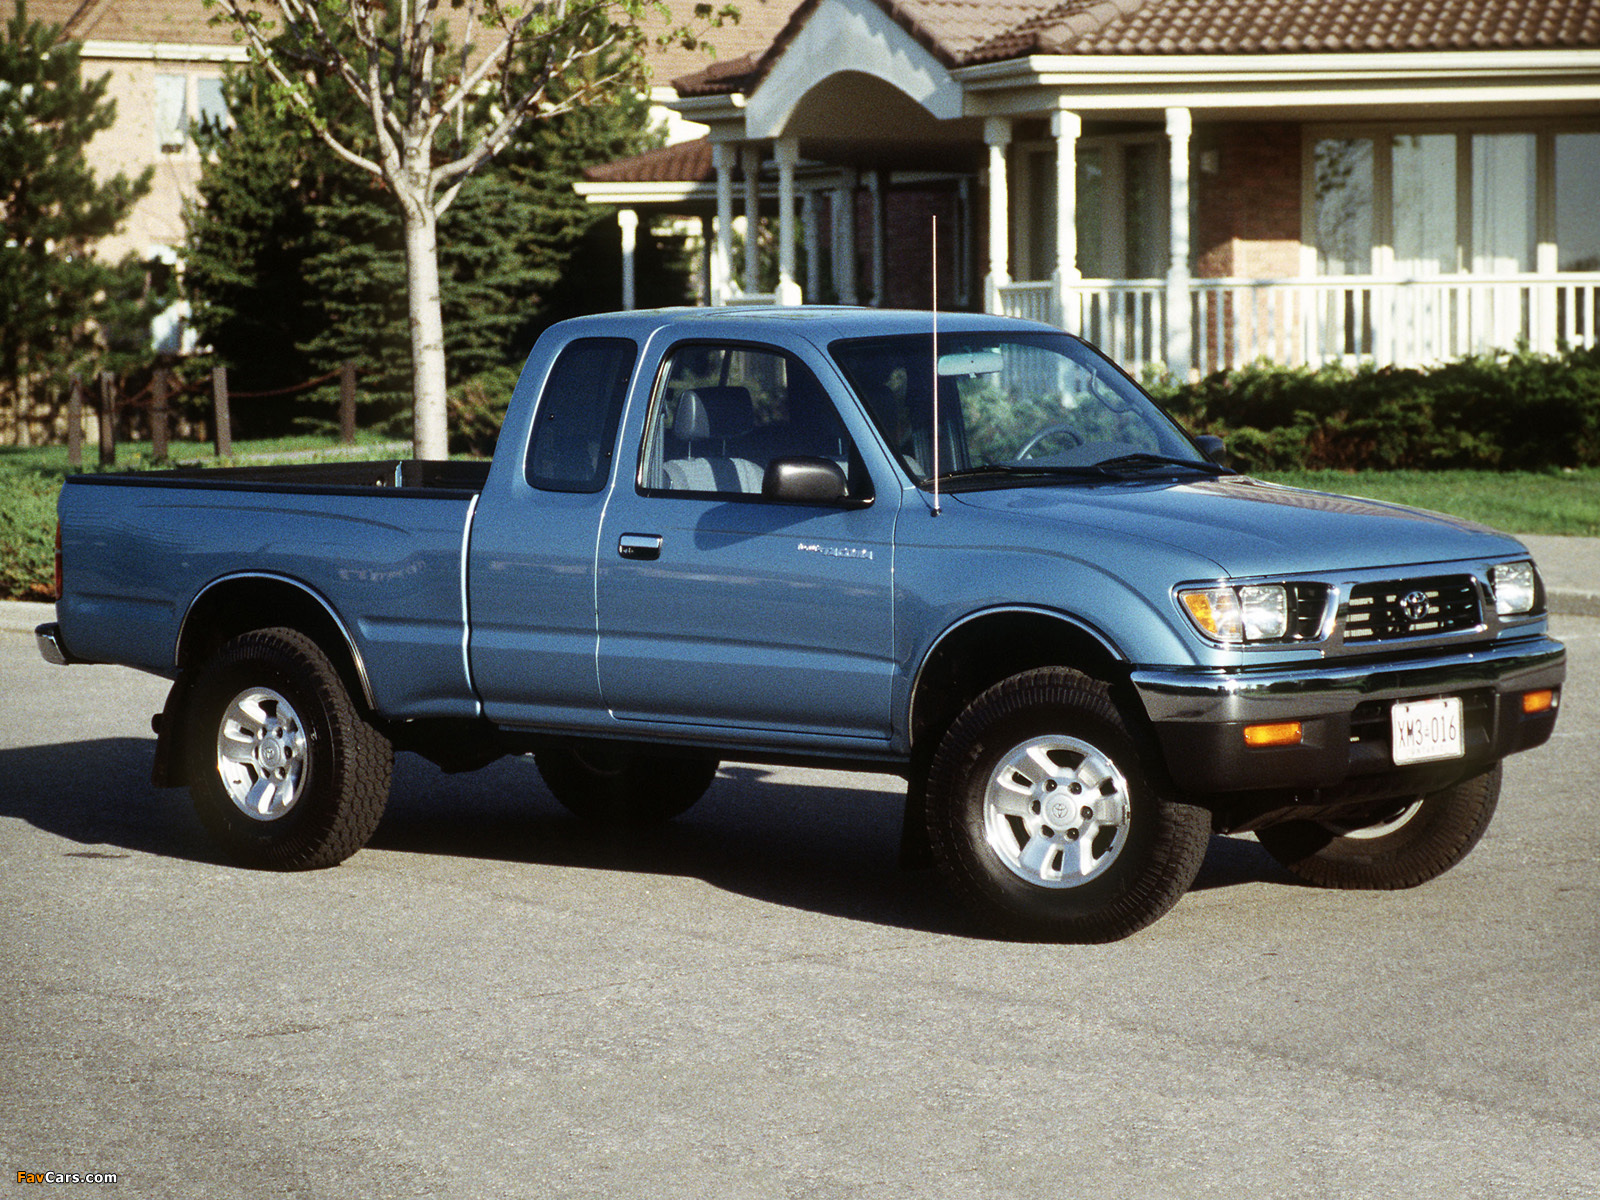 Toyota Tacoma Xtracab 4wd 1995 98 Images 1600x1200